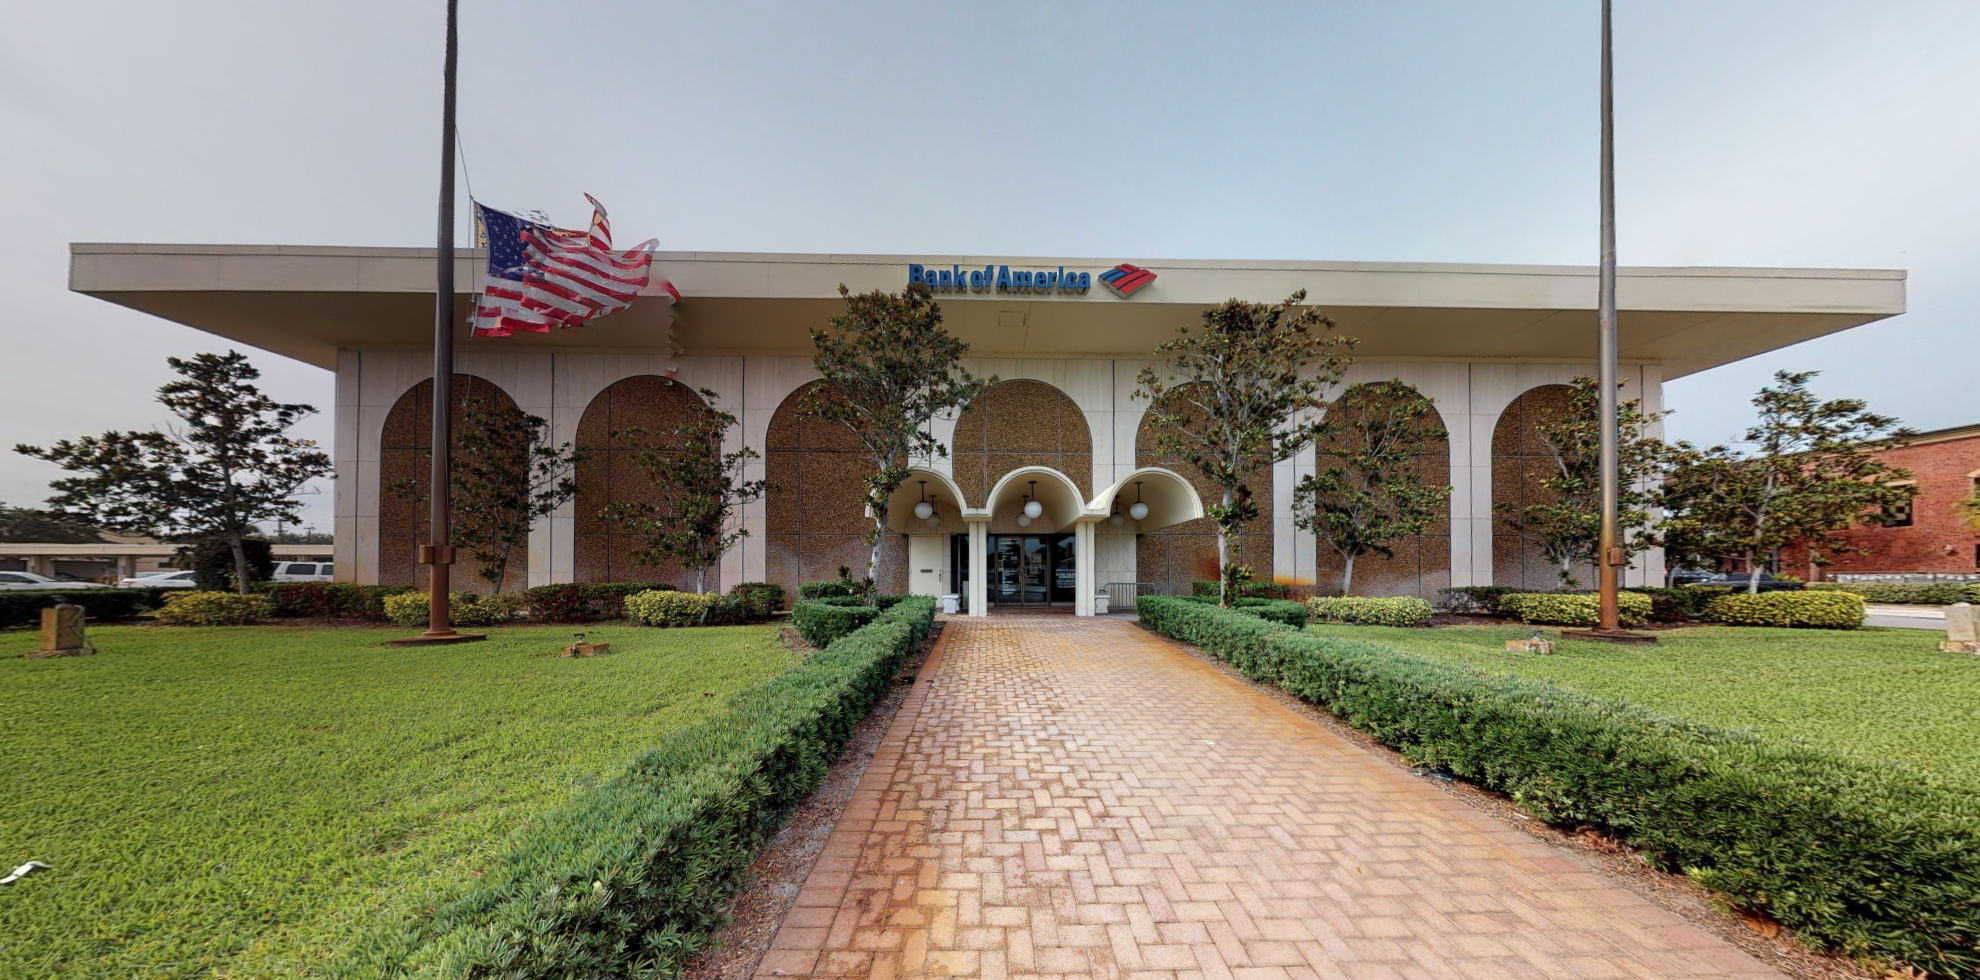 Bank of America financial center with drive-thru ATM | 205 N Parrott Ave, Okeechobee, FL 34972